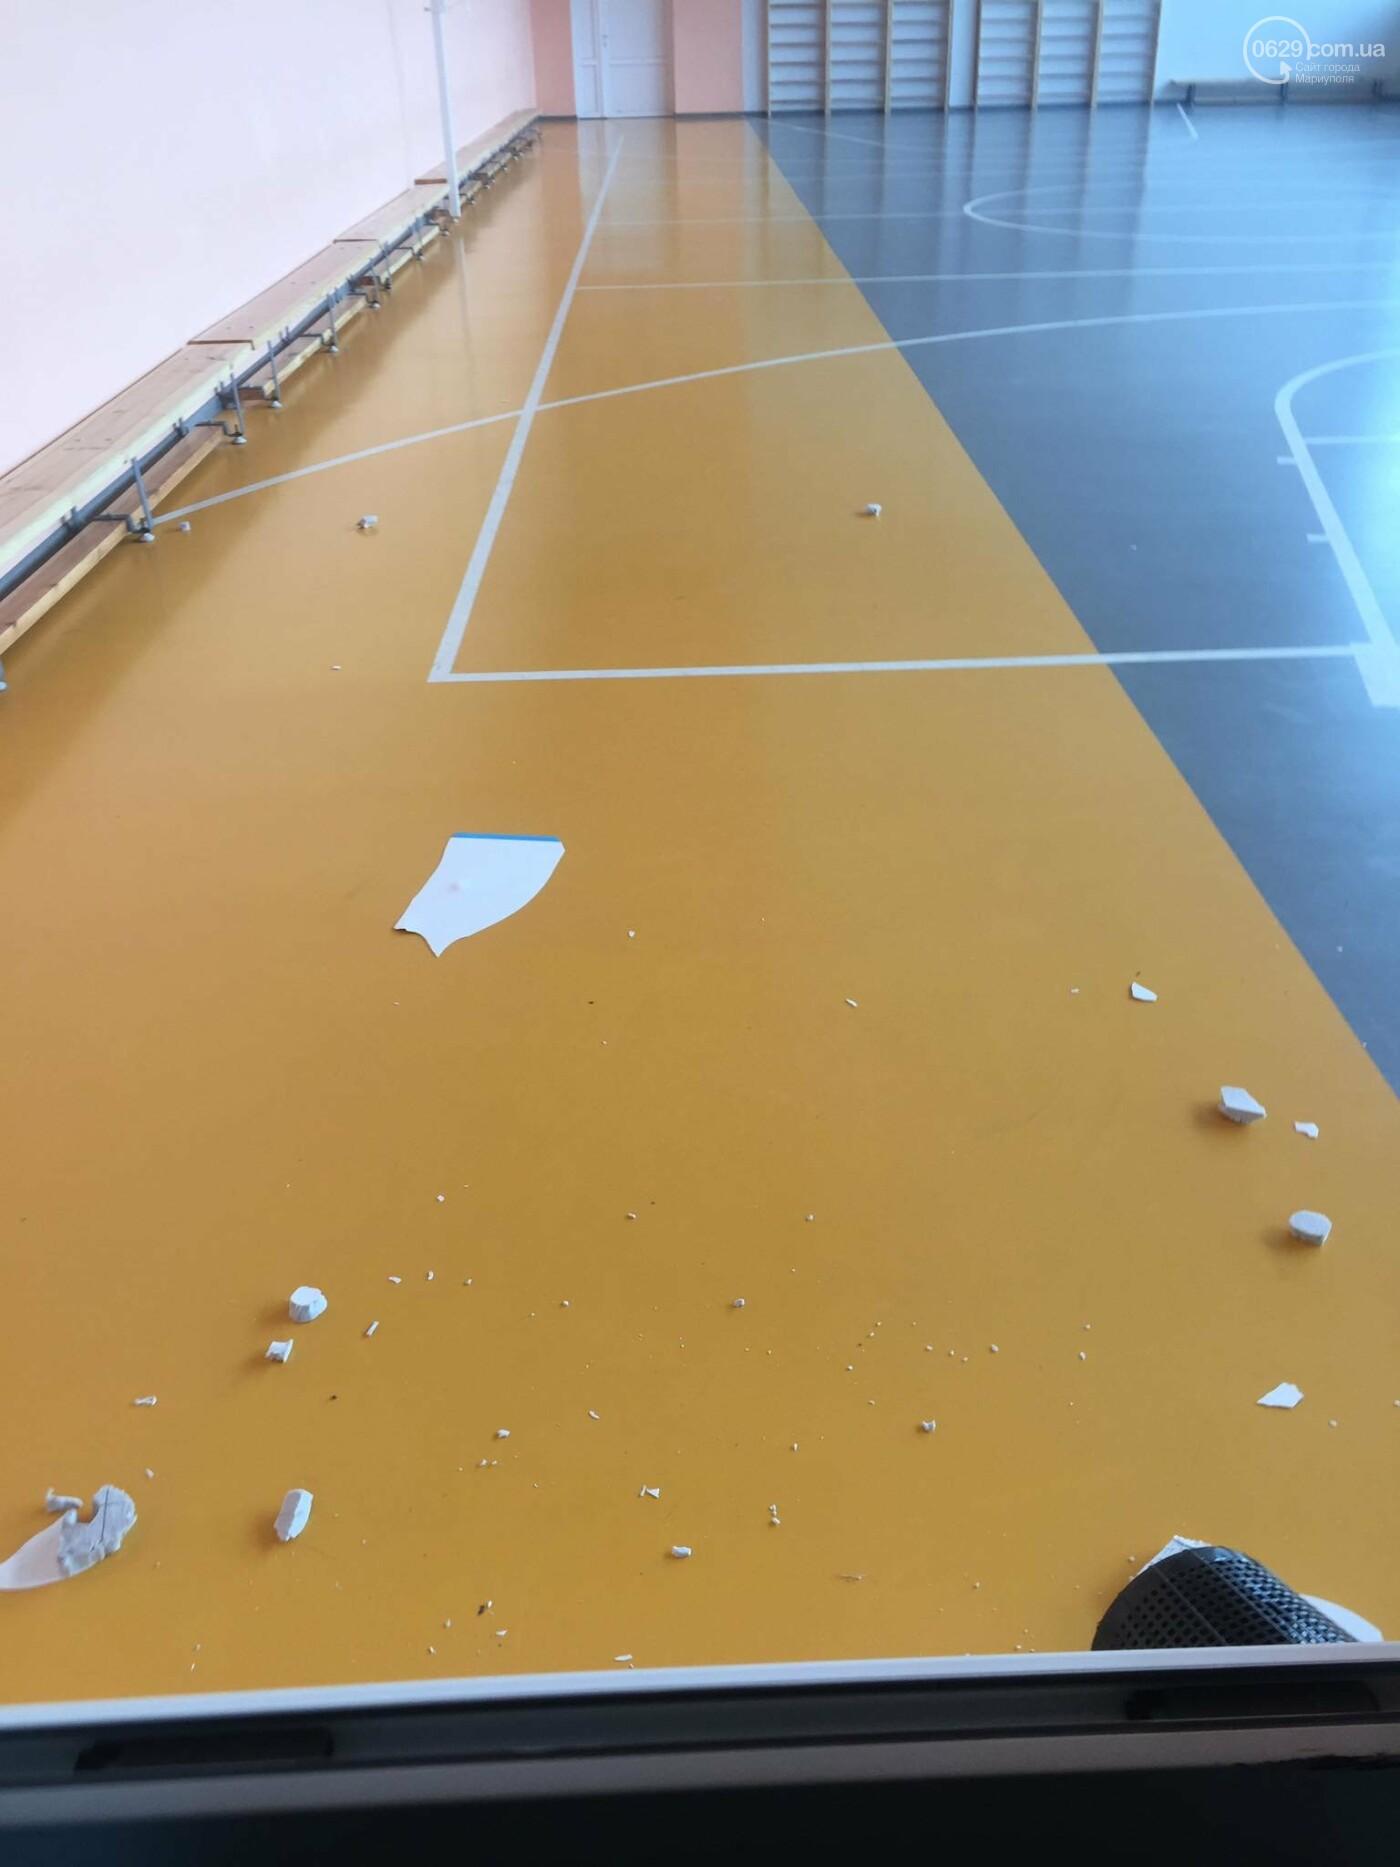 В  Мариуполе неадекватный хулиган разгромил школу, - ДОПОЛНЕНО, ФОТО, фото-3